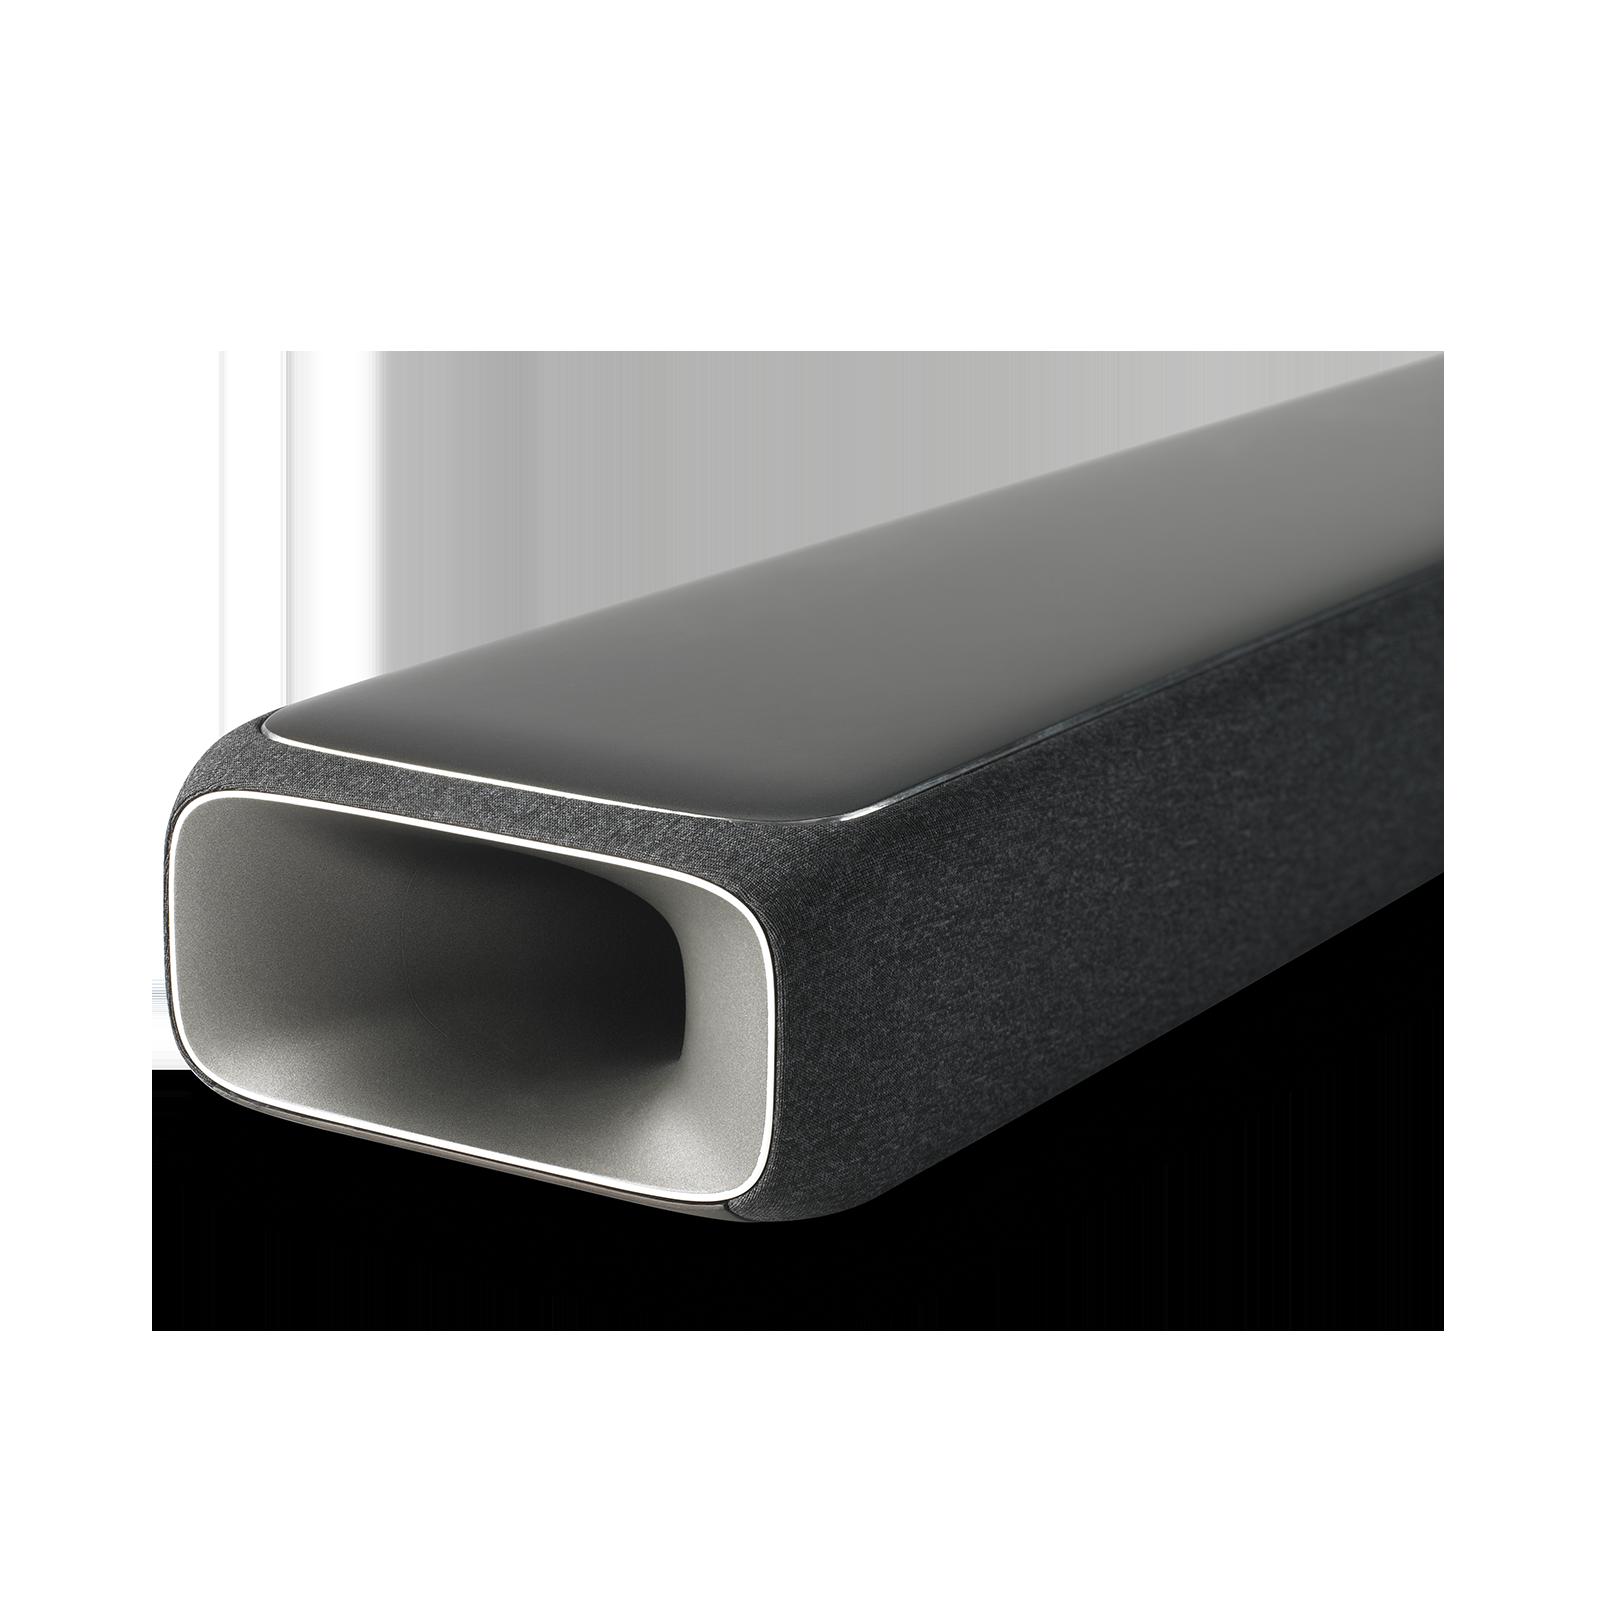 Enchant 1300 - Graphite - All in One 13-Channel Soundbar with MultiBeam™ Surround Sound - Detailshot 1